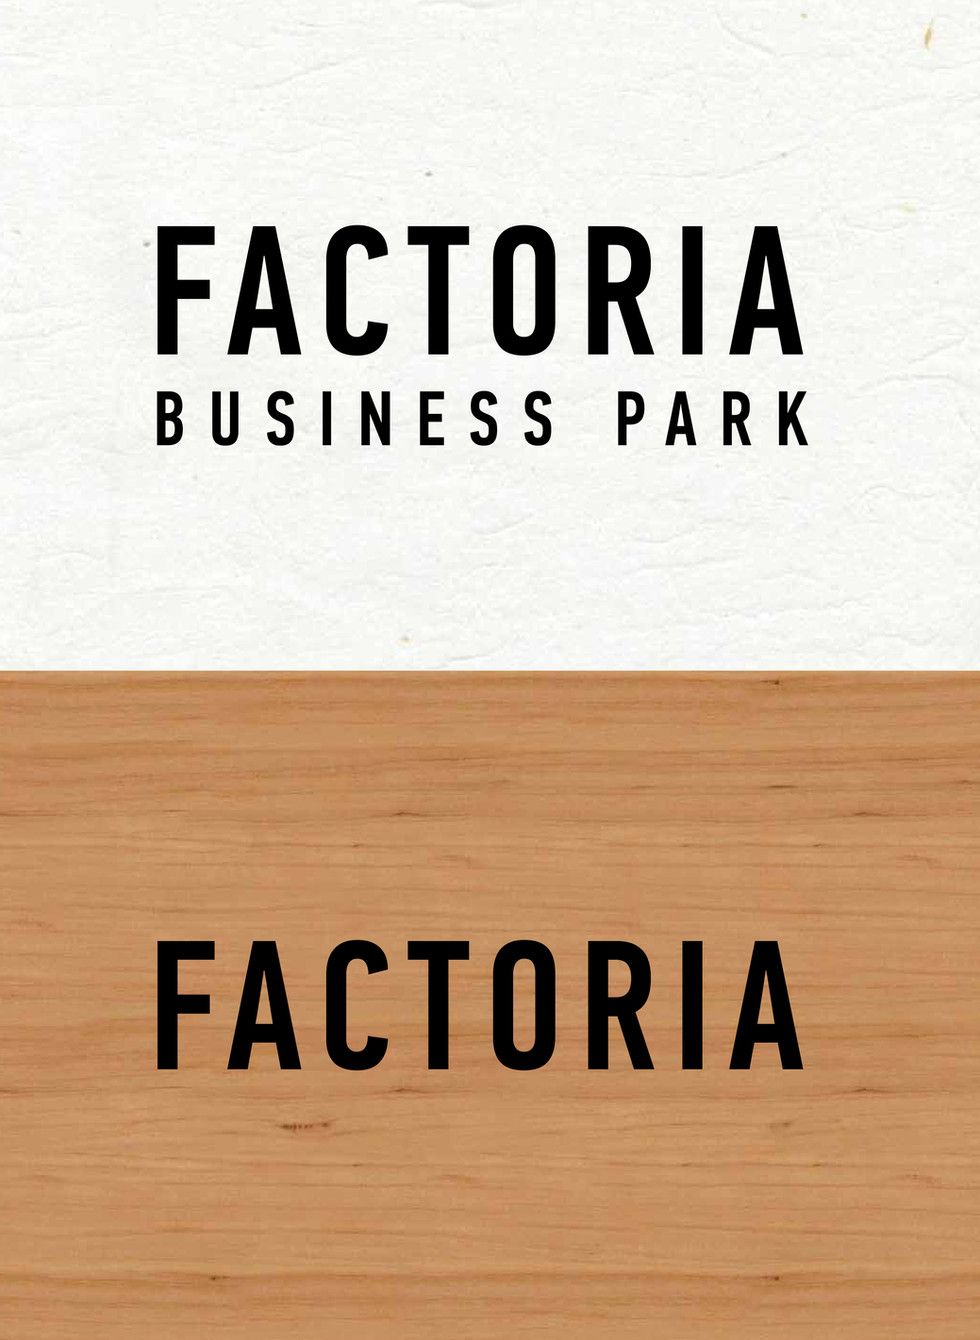 Factoria plain logo